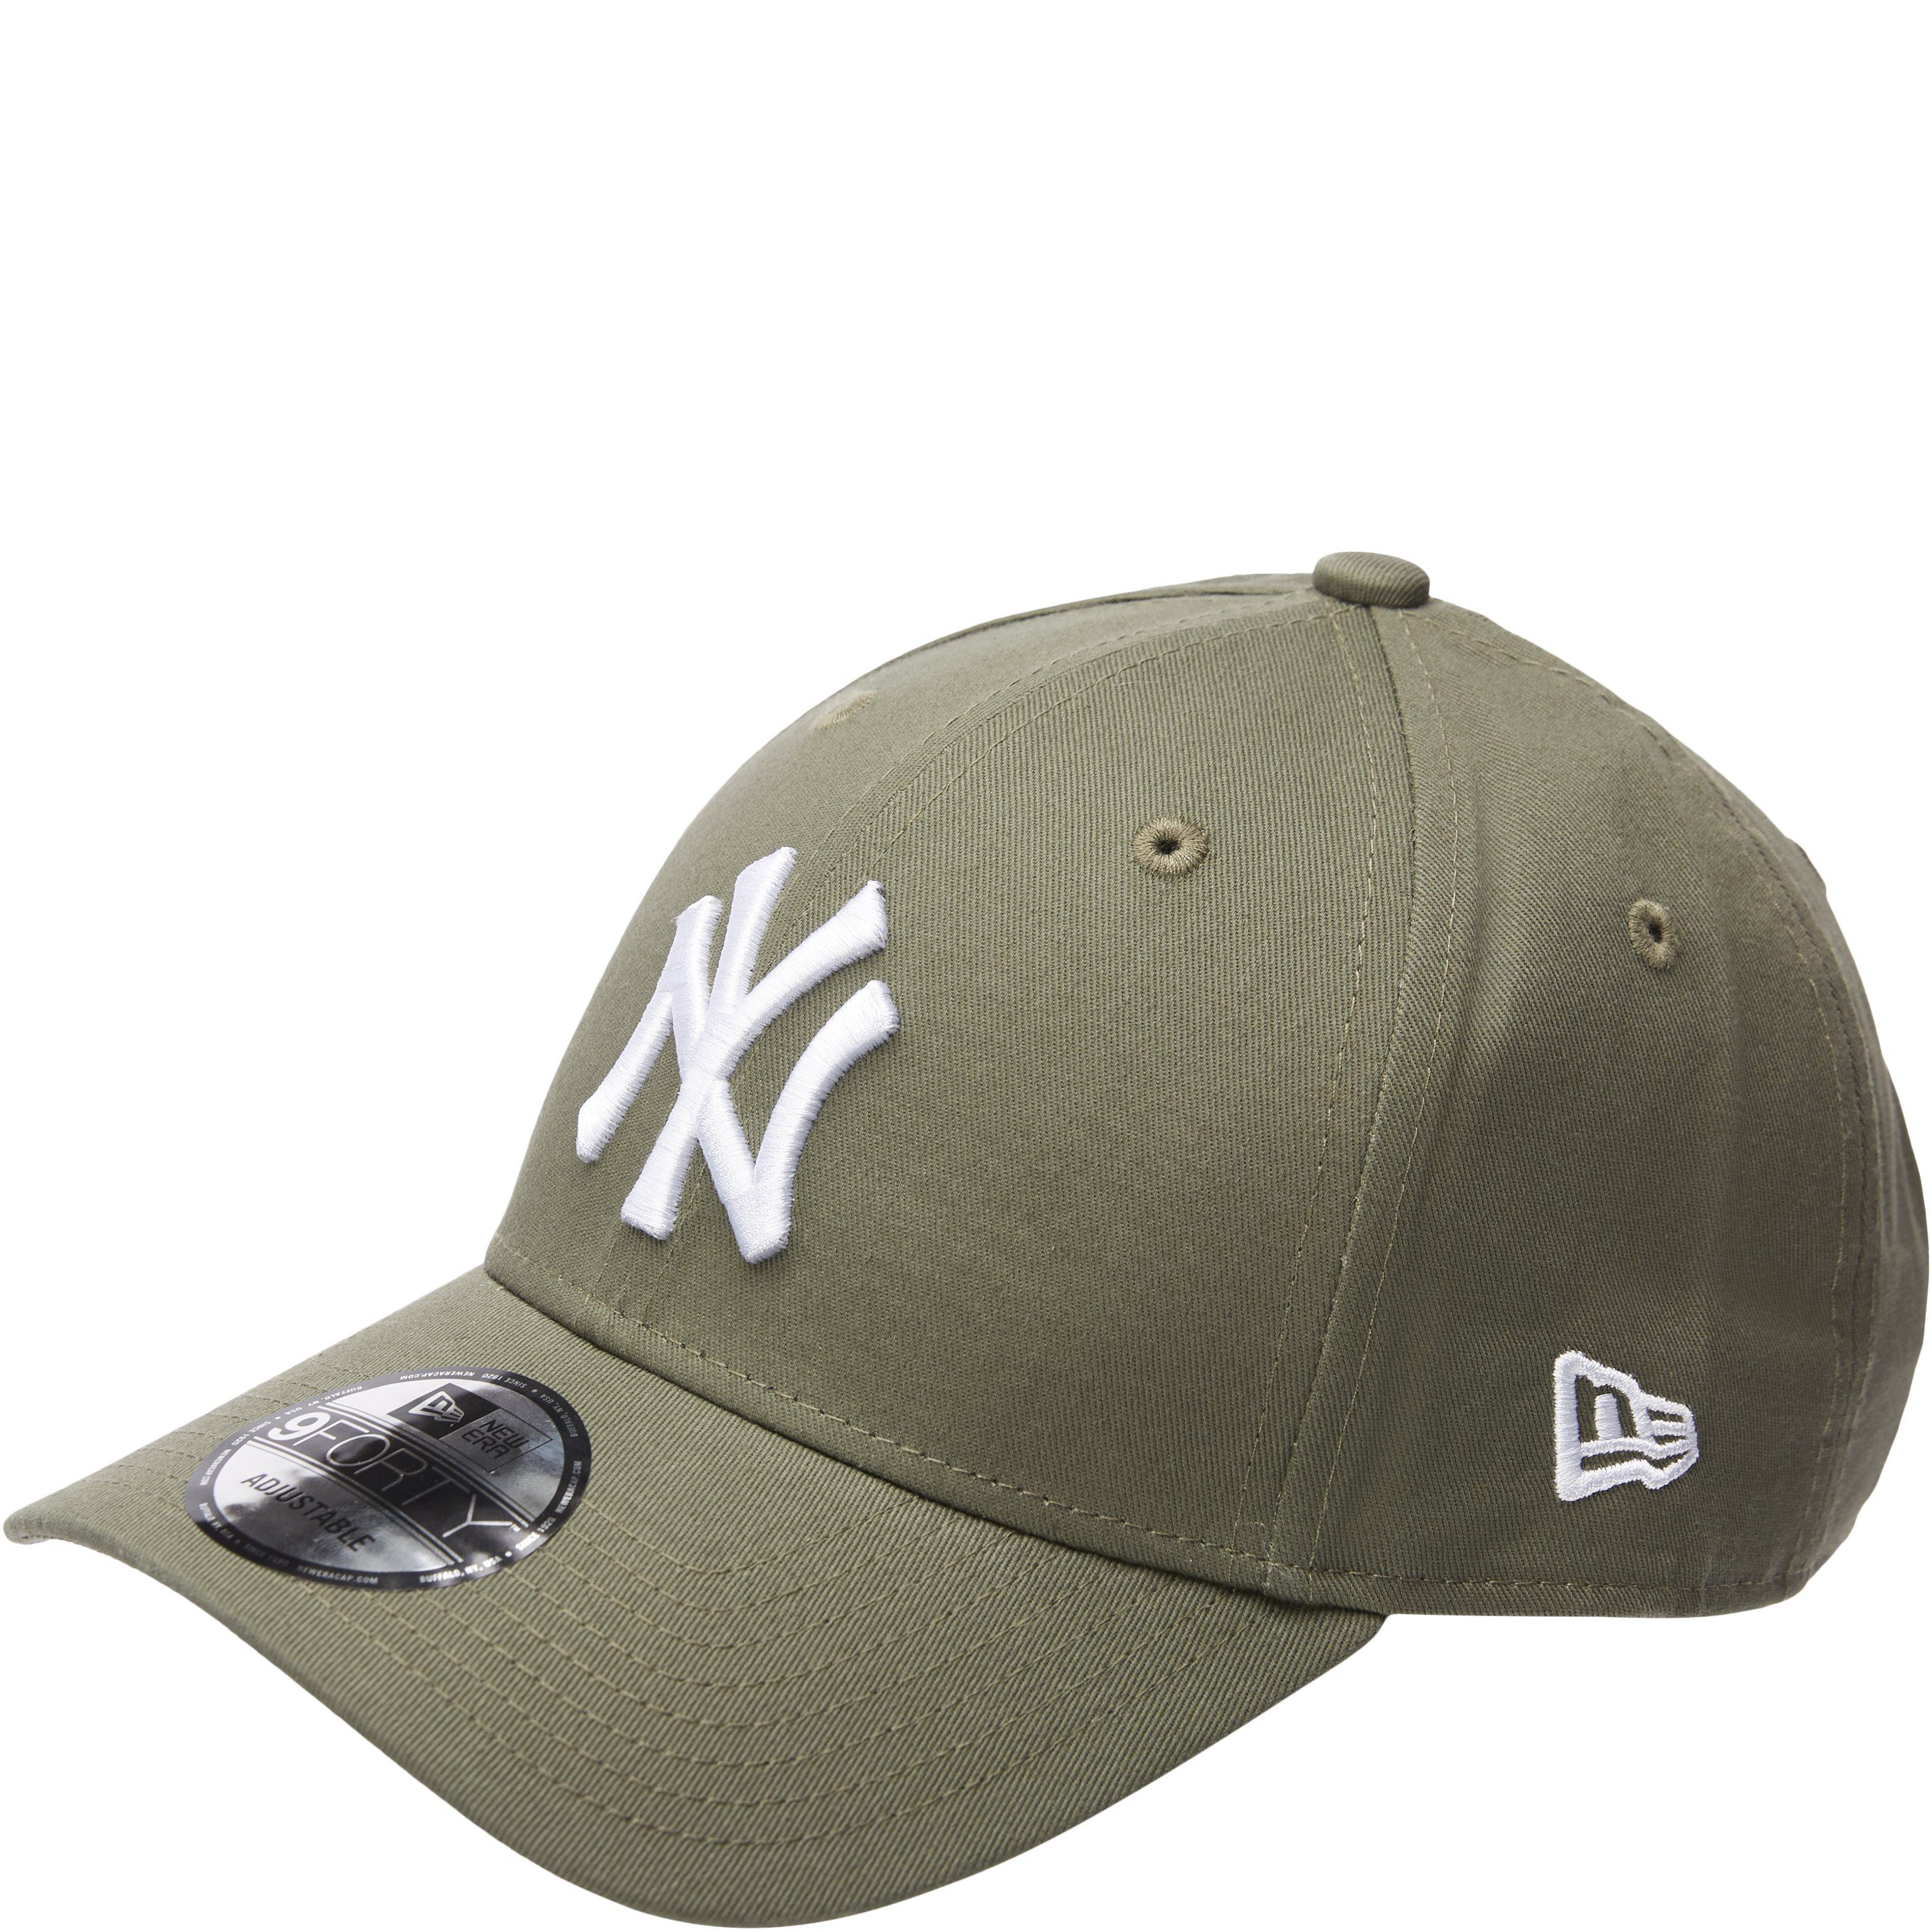 Yankees Strapback Cap - Caps - Grøn